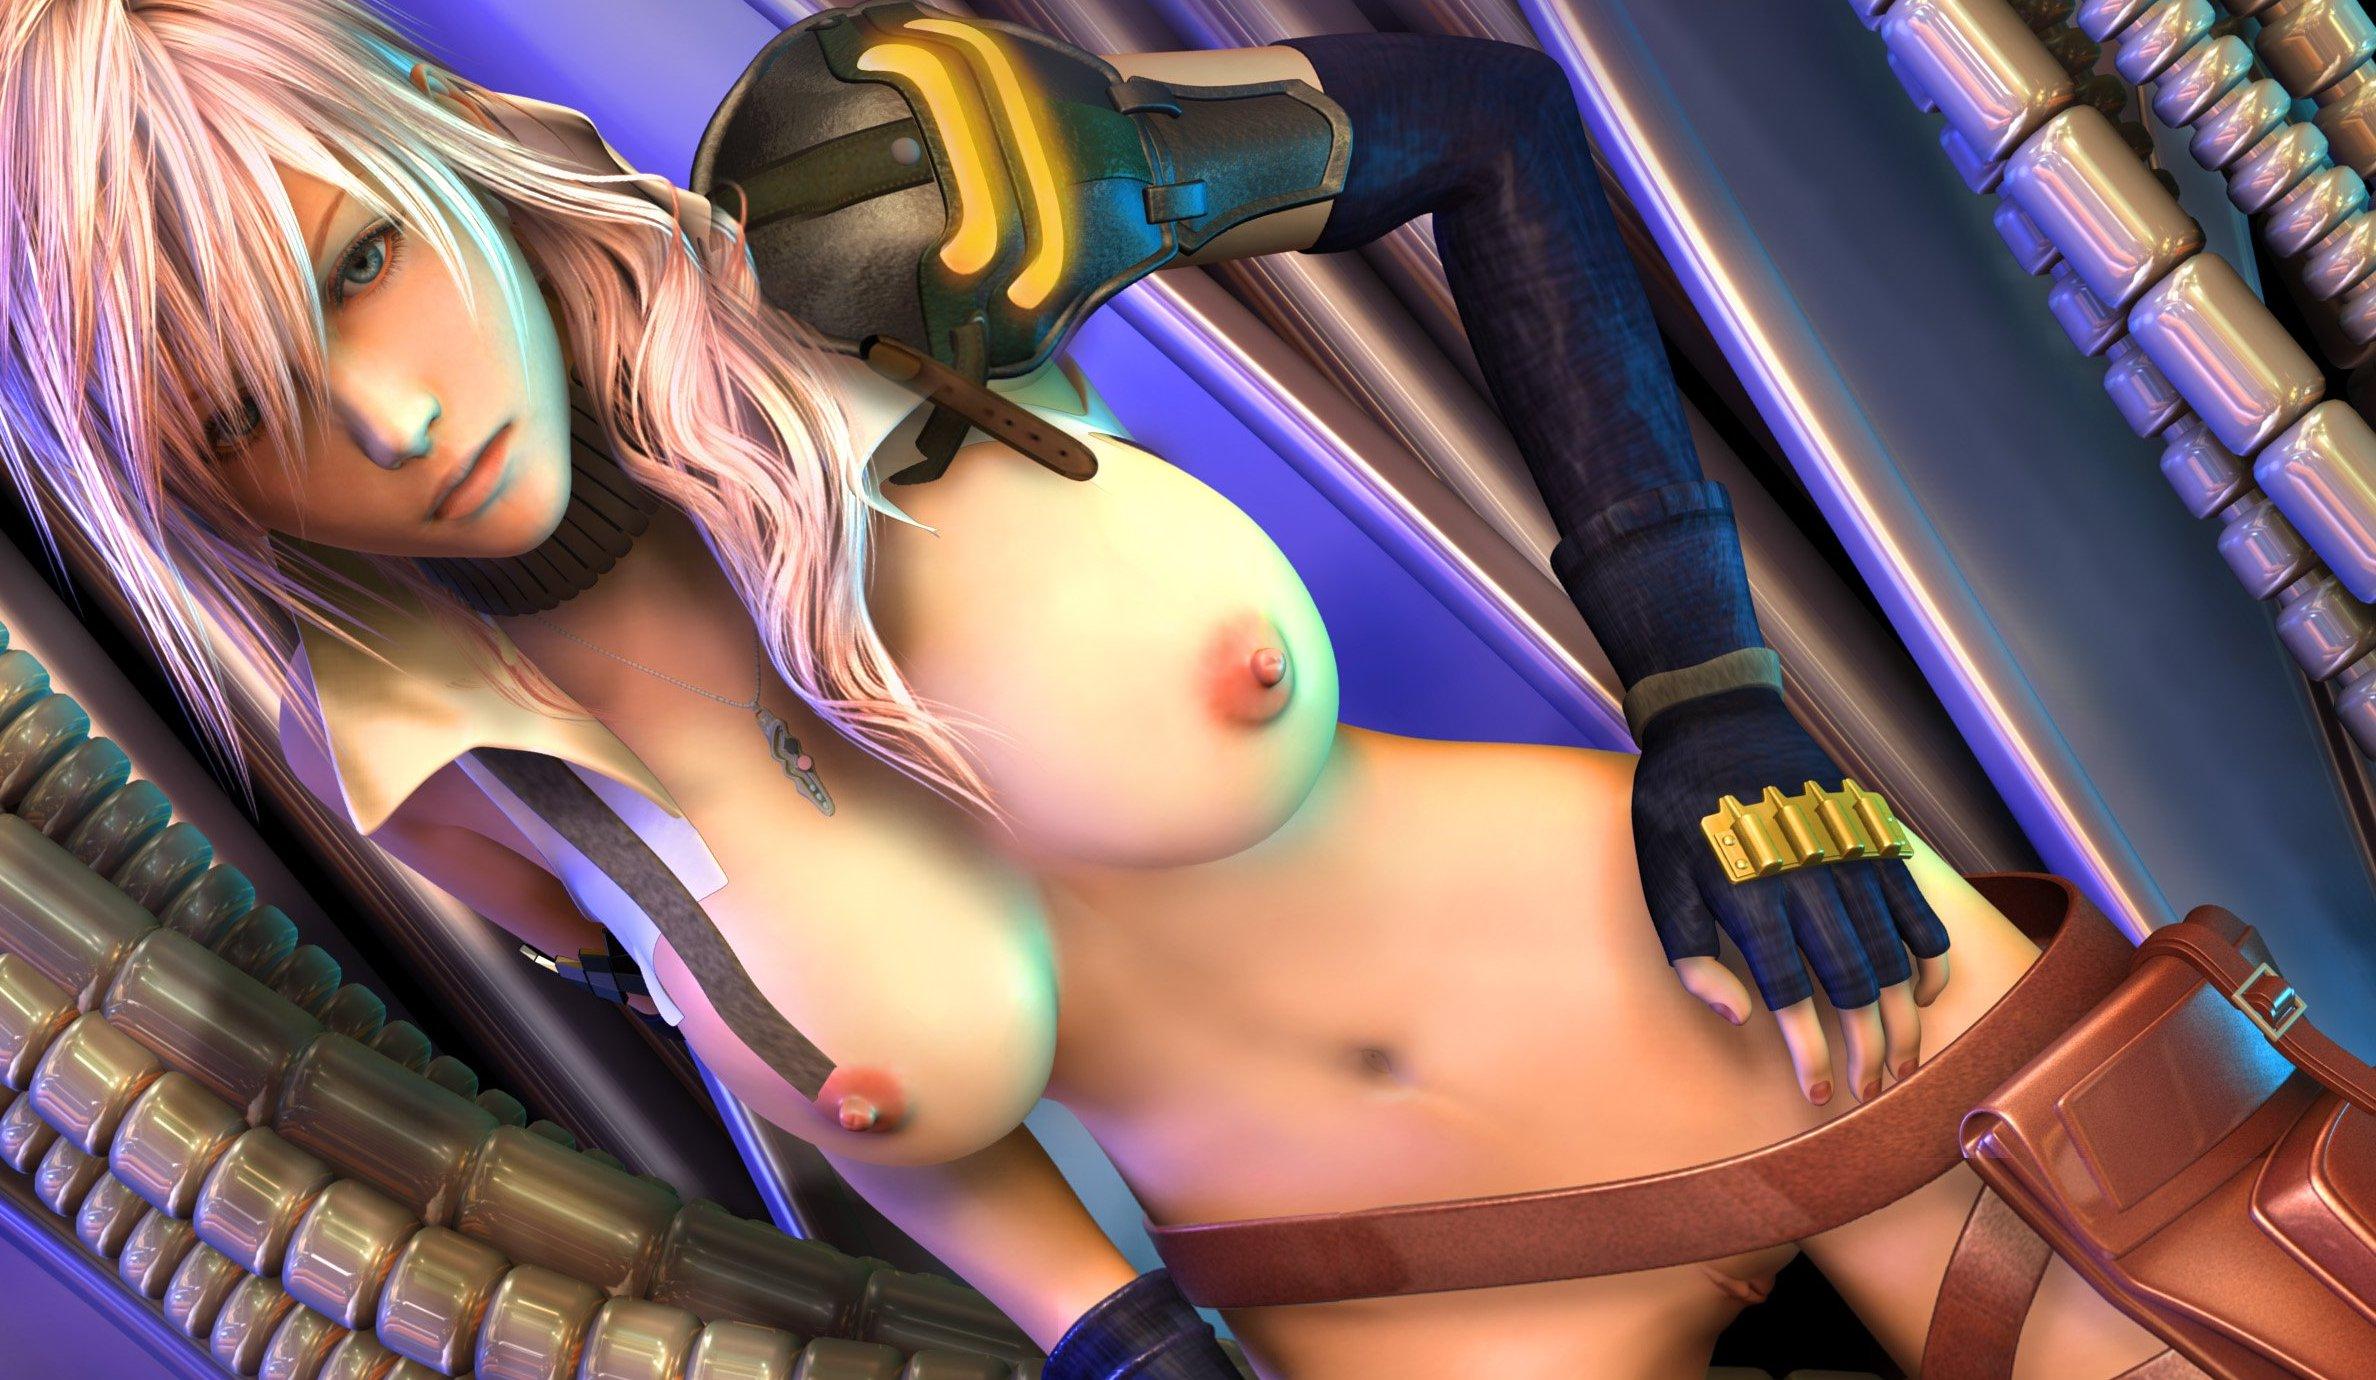 Mine Final fantasy cgi sex animation consider, that